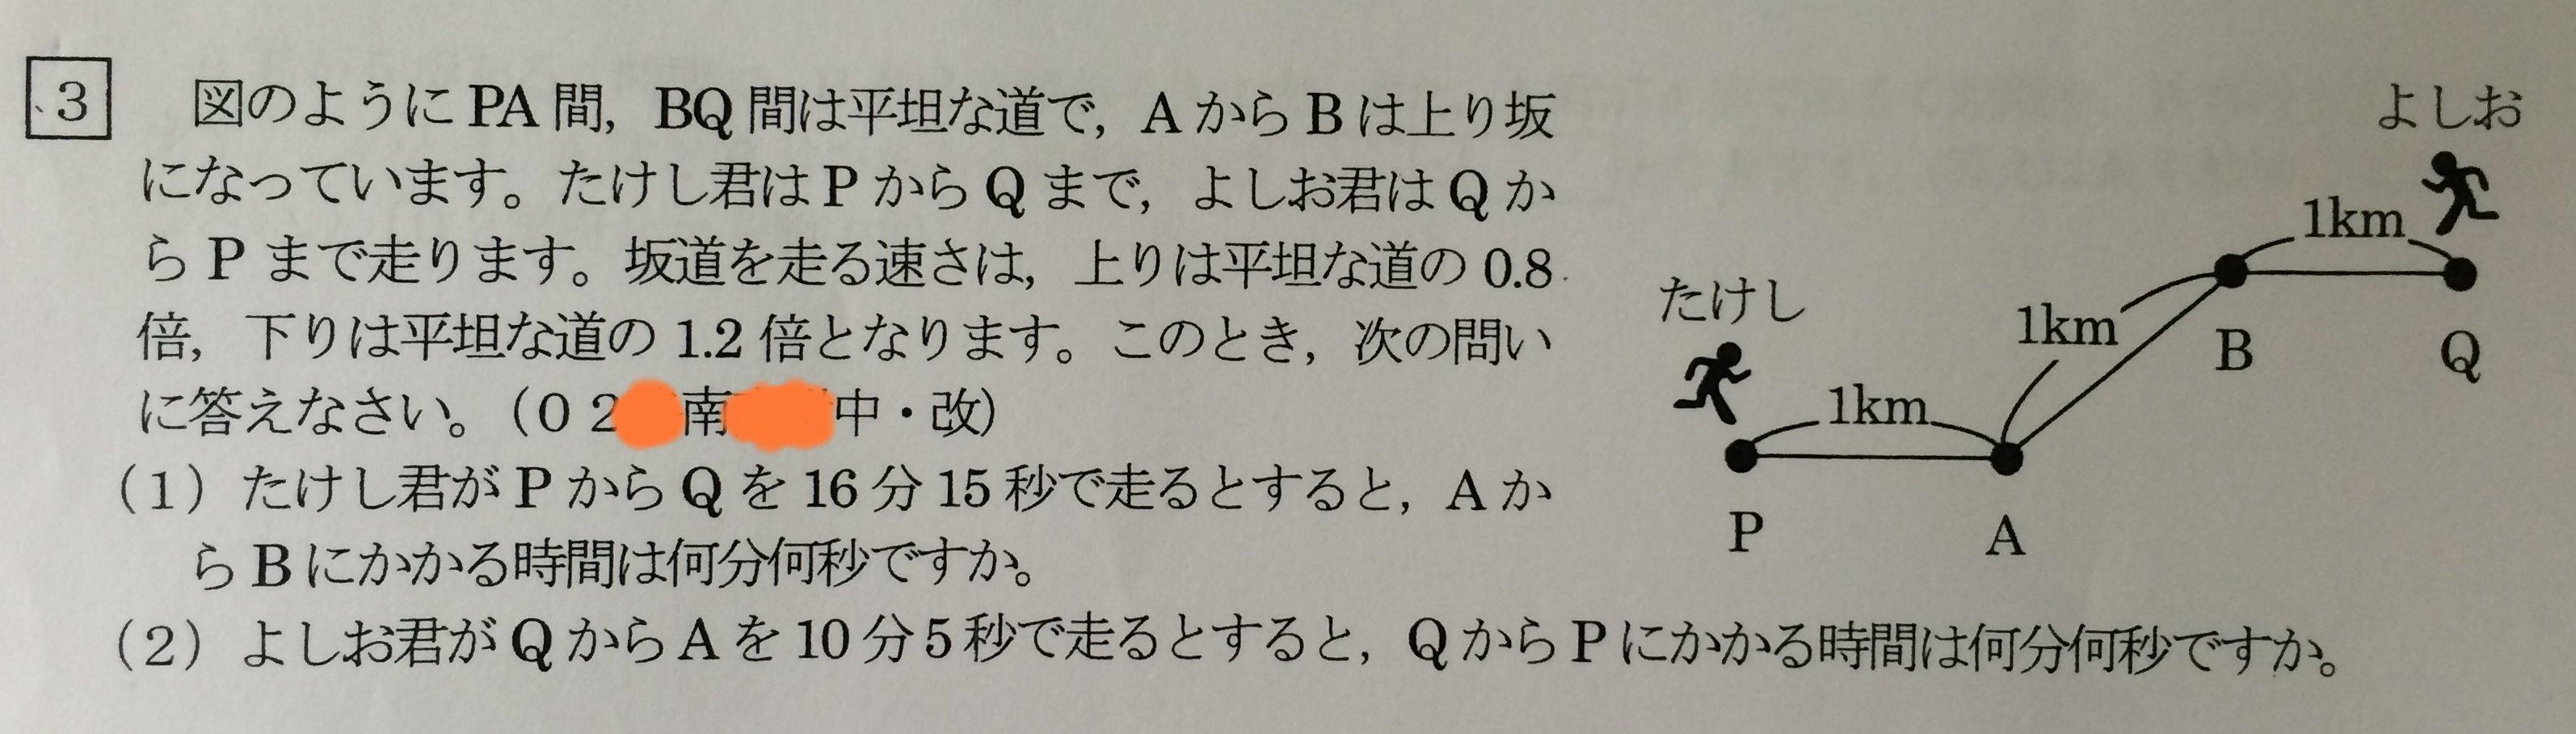 Img_11611.jpg